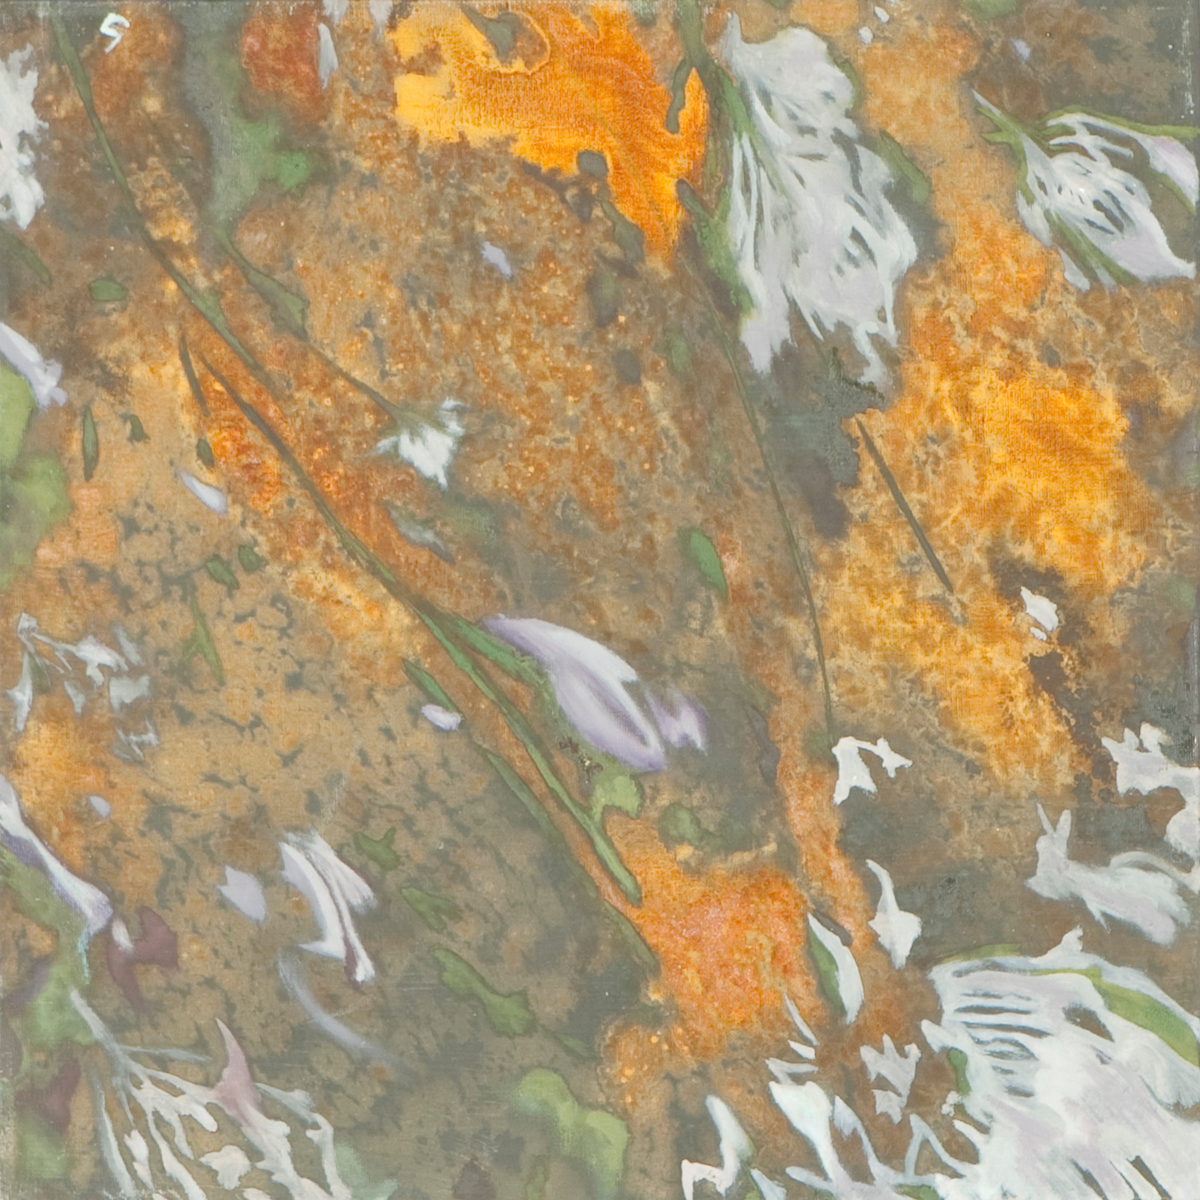 Disintegration ii unframed 1200 x 1200 for original art page sybx2r